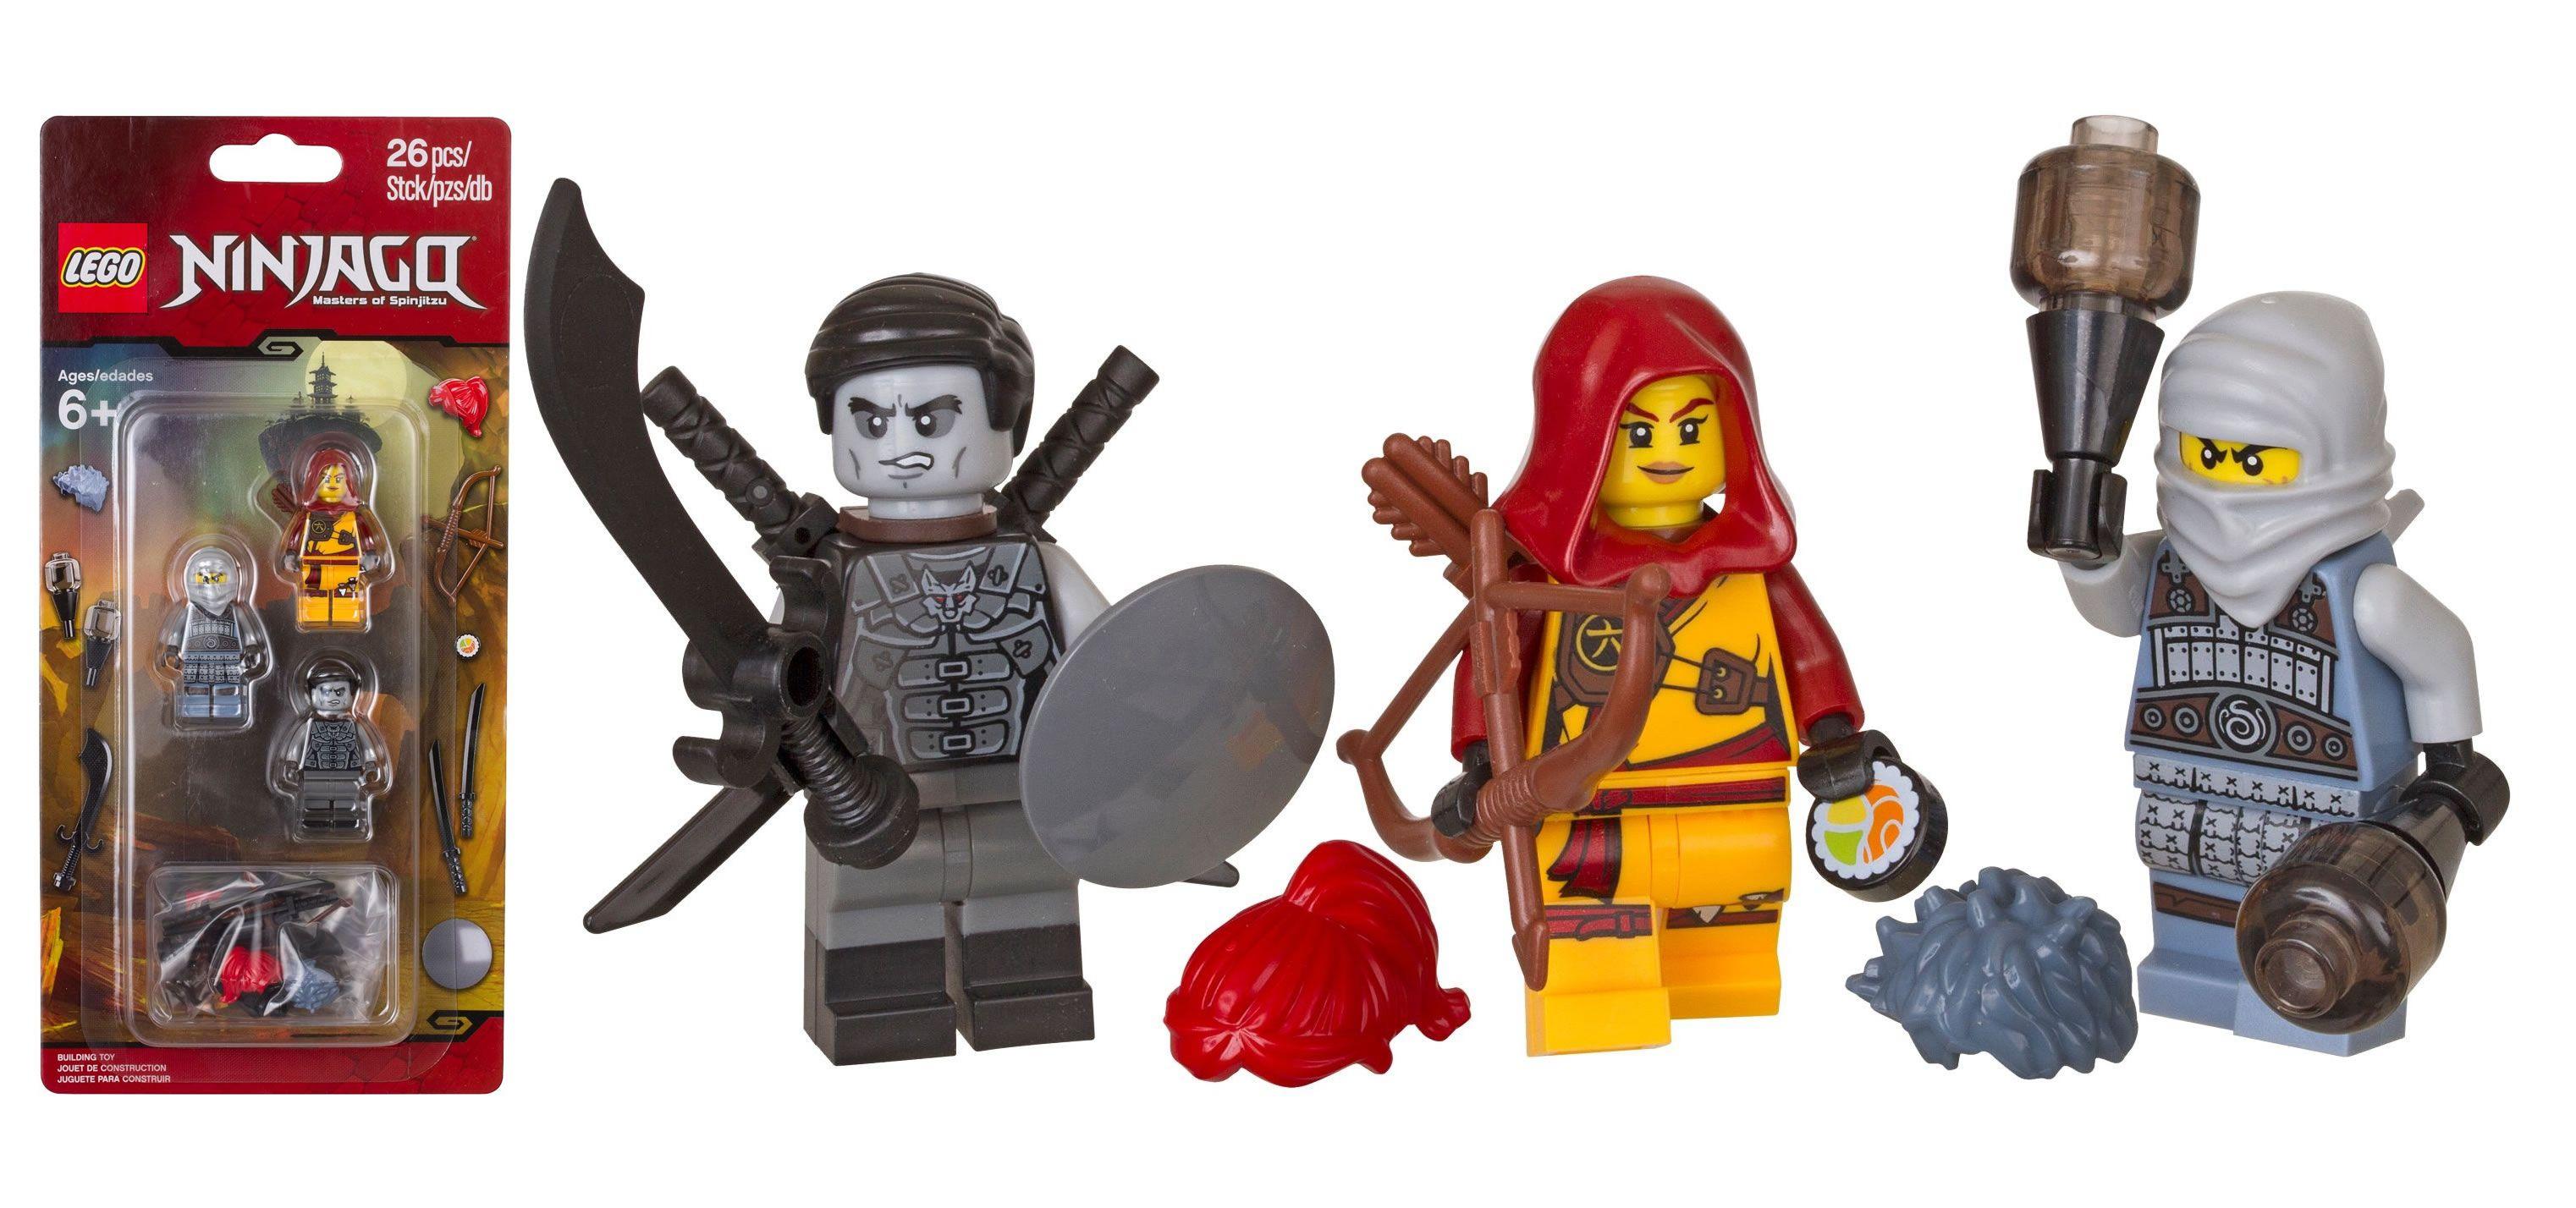 En mars 853687 lego ninjago accessory pack avec skylor shade et ash d s le 1er mars prochain - Lego ninjago saison 7 ...